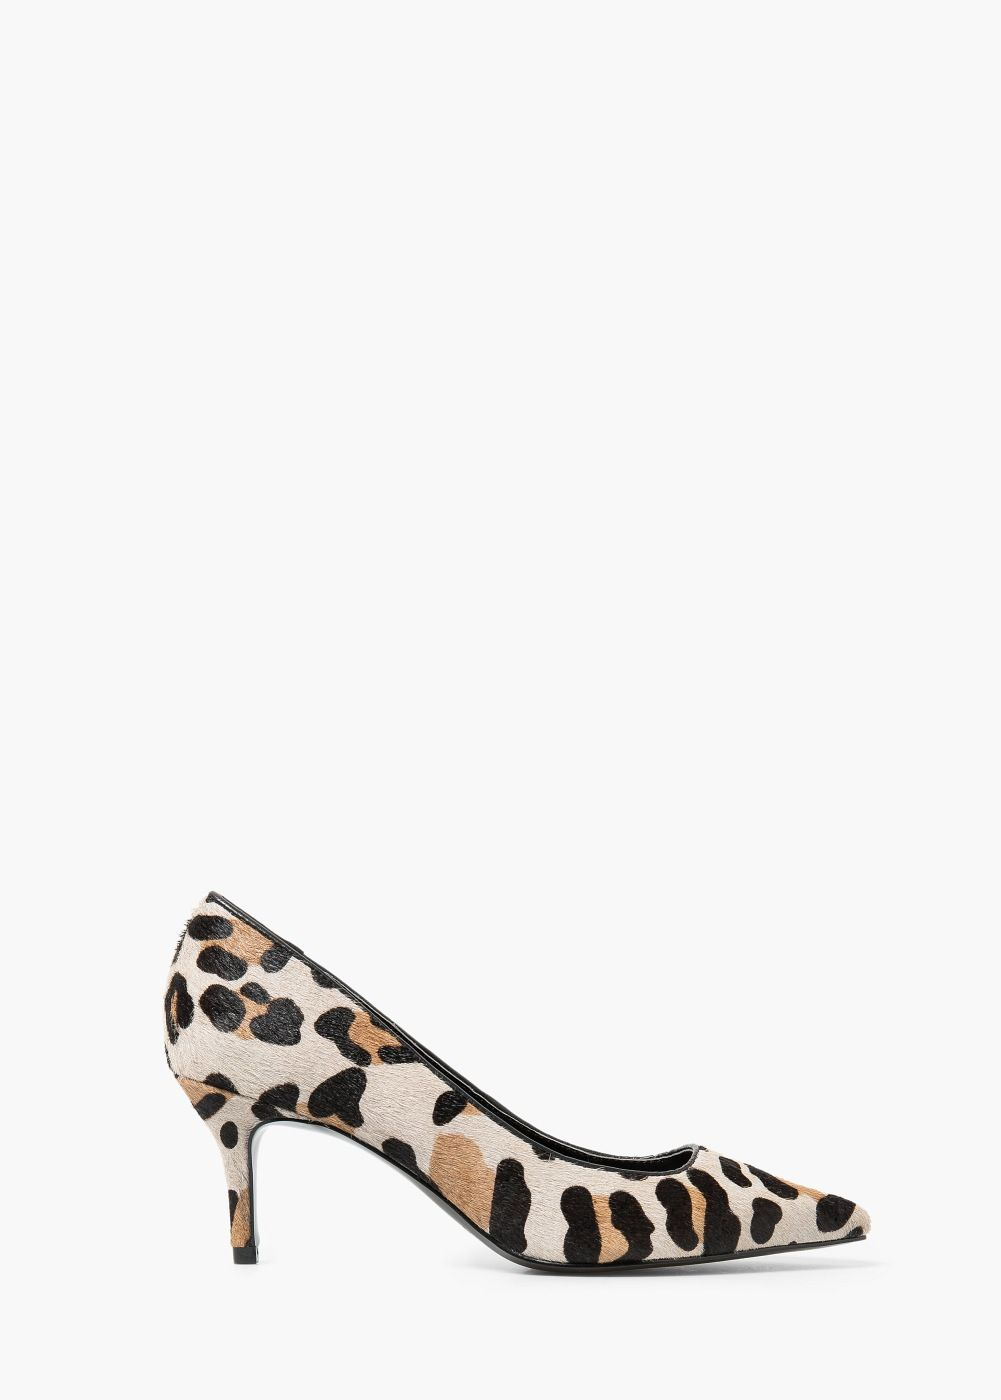 3b83b994c826 Escarpins léopard - Femme